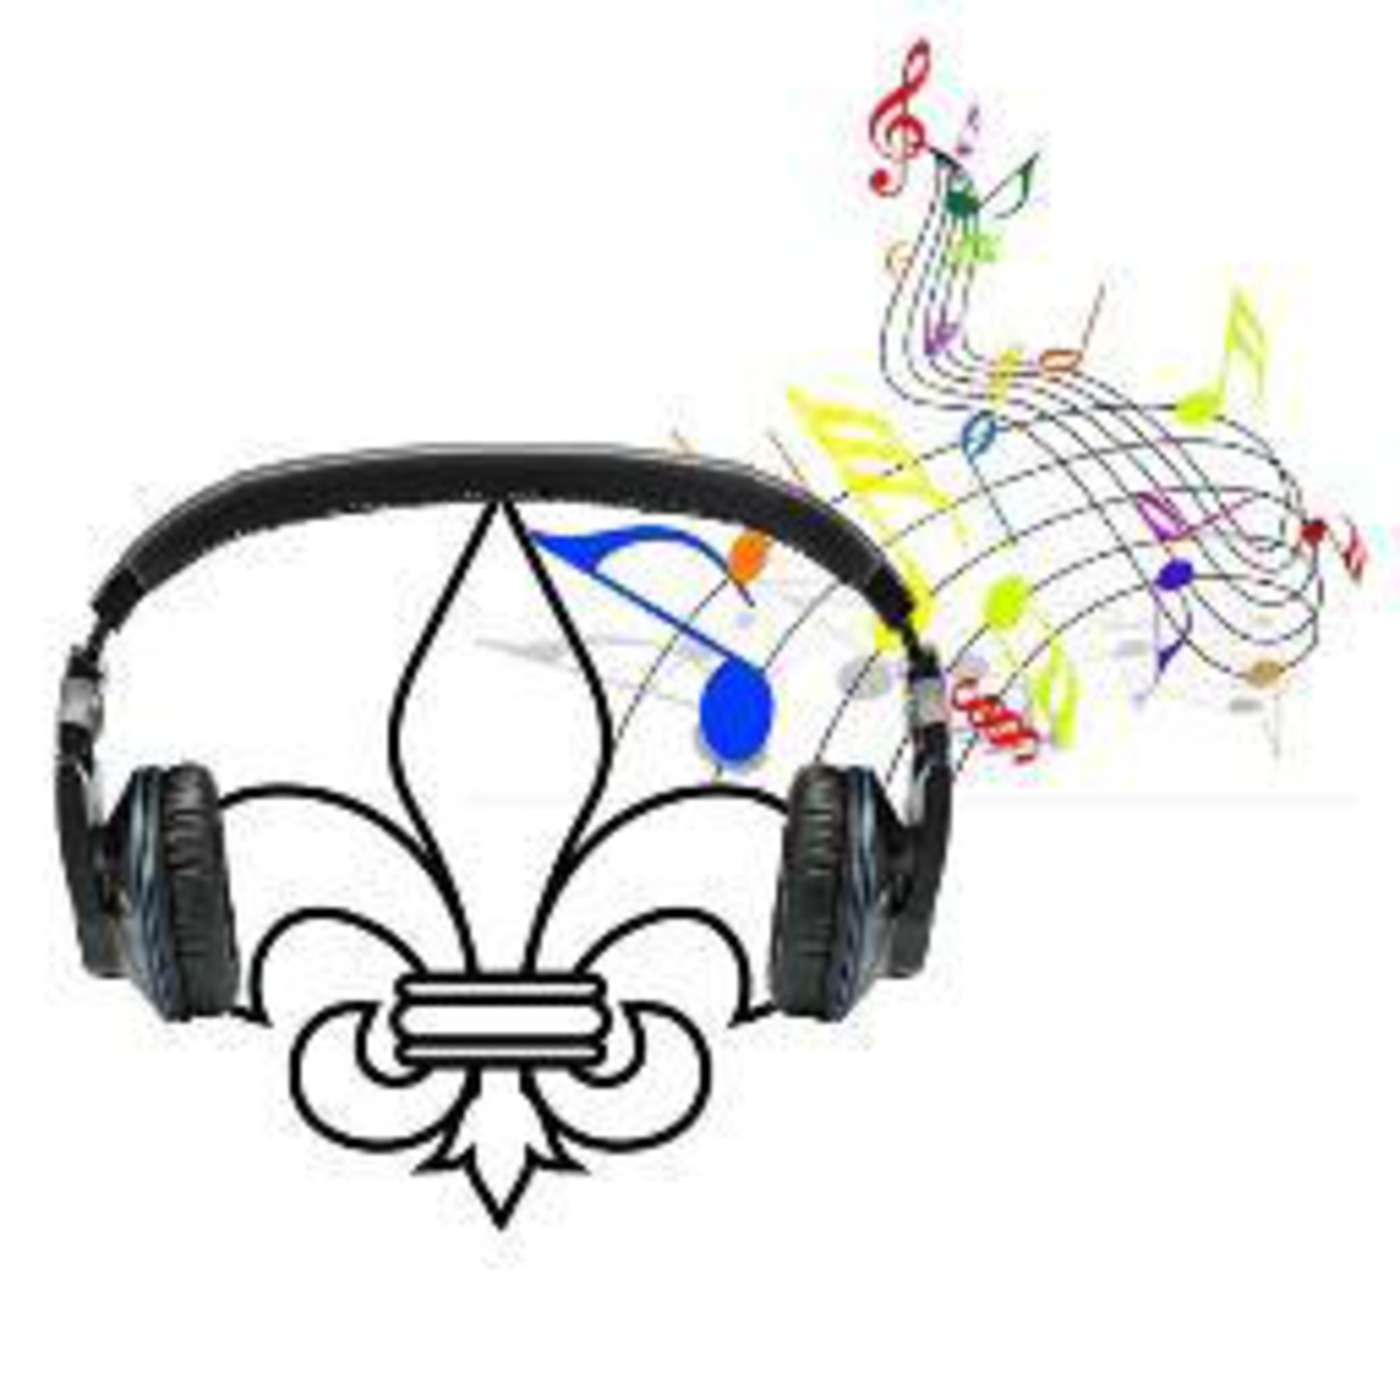 NS Morumbi Rádio's Podcast